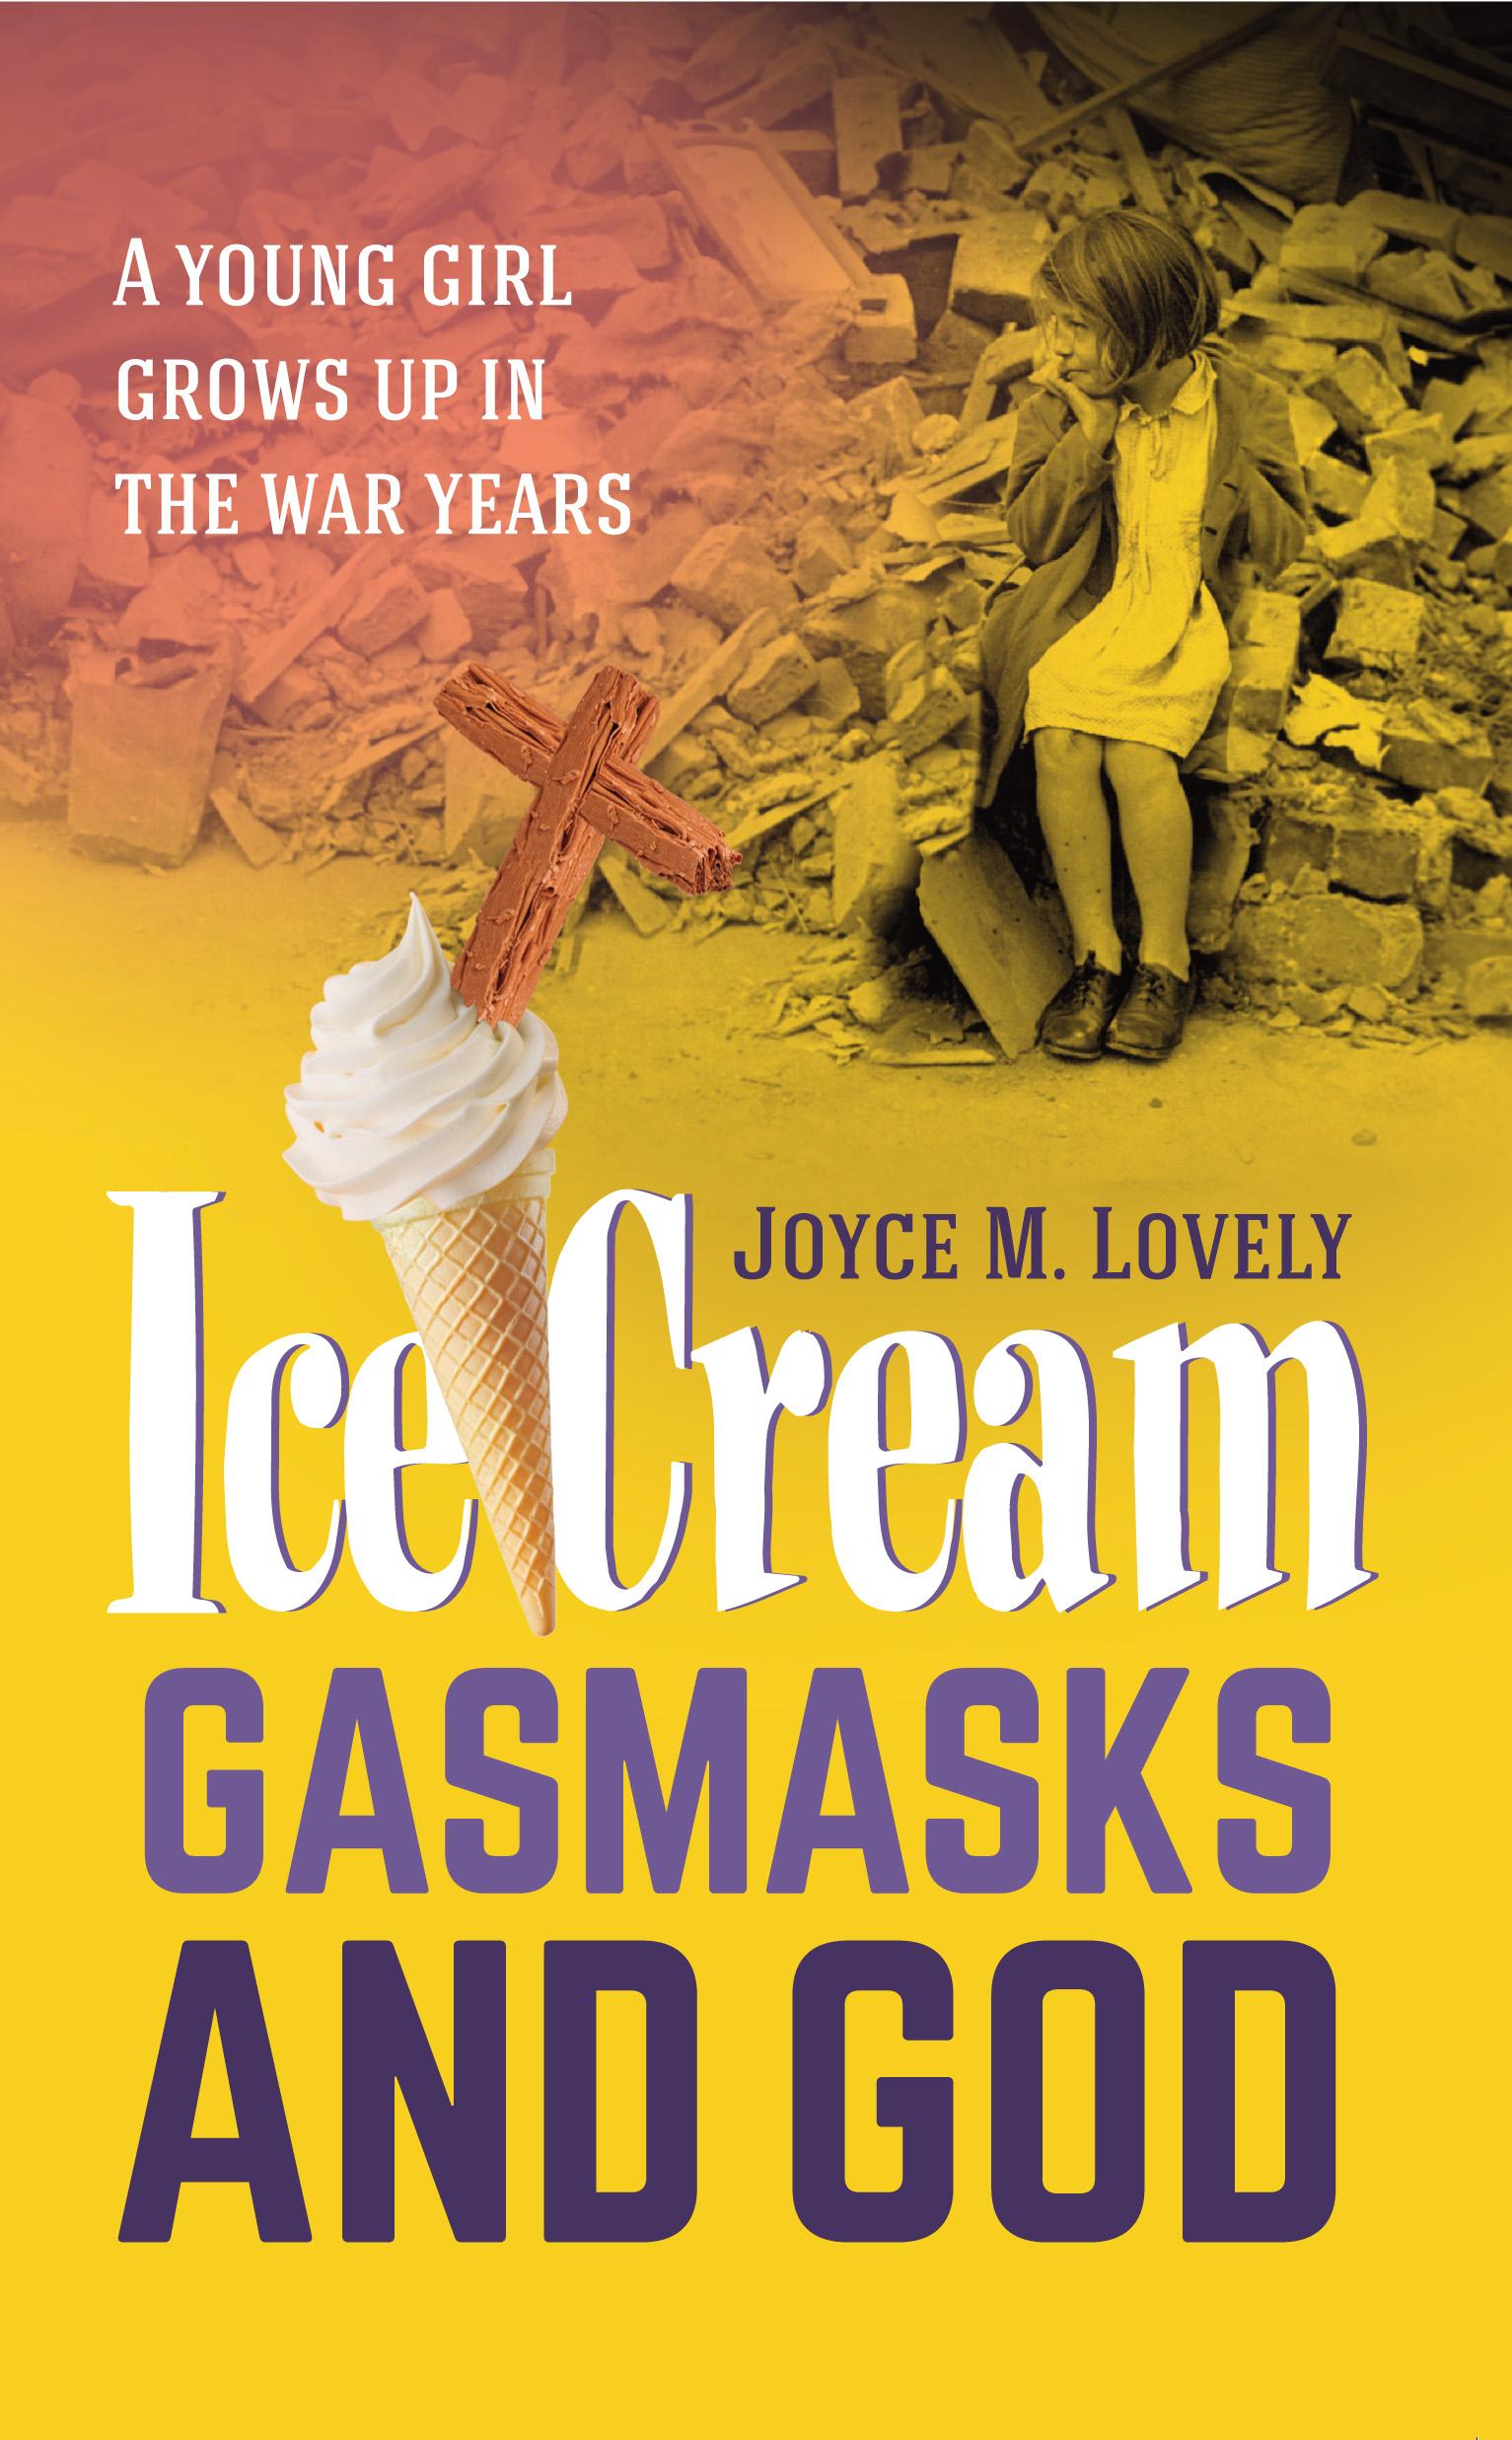 Ice Cream Mask Ice Cream Gas Masks And